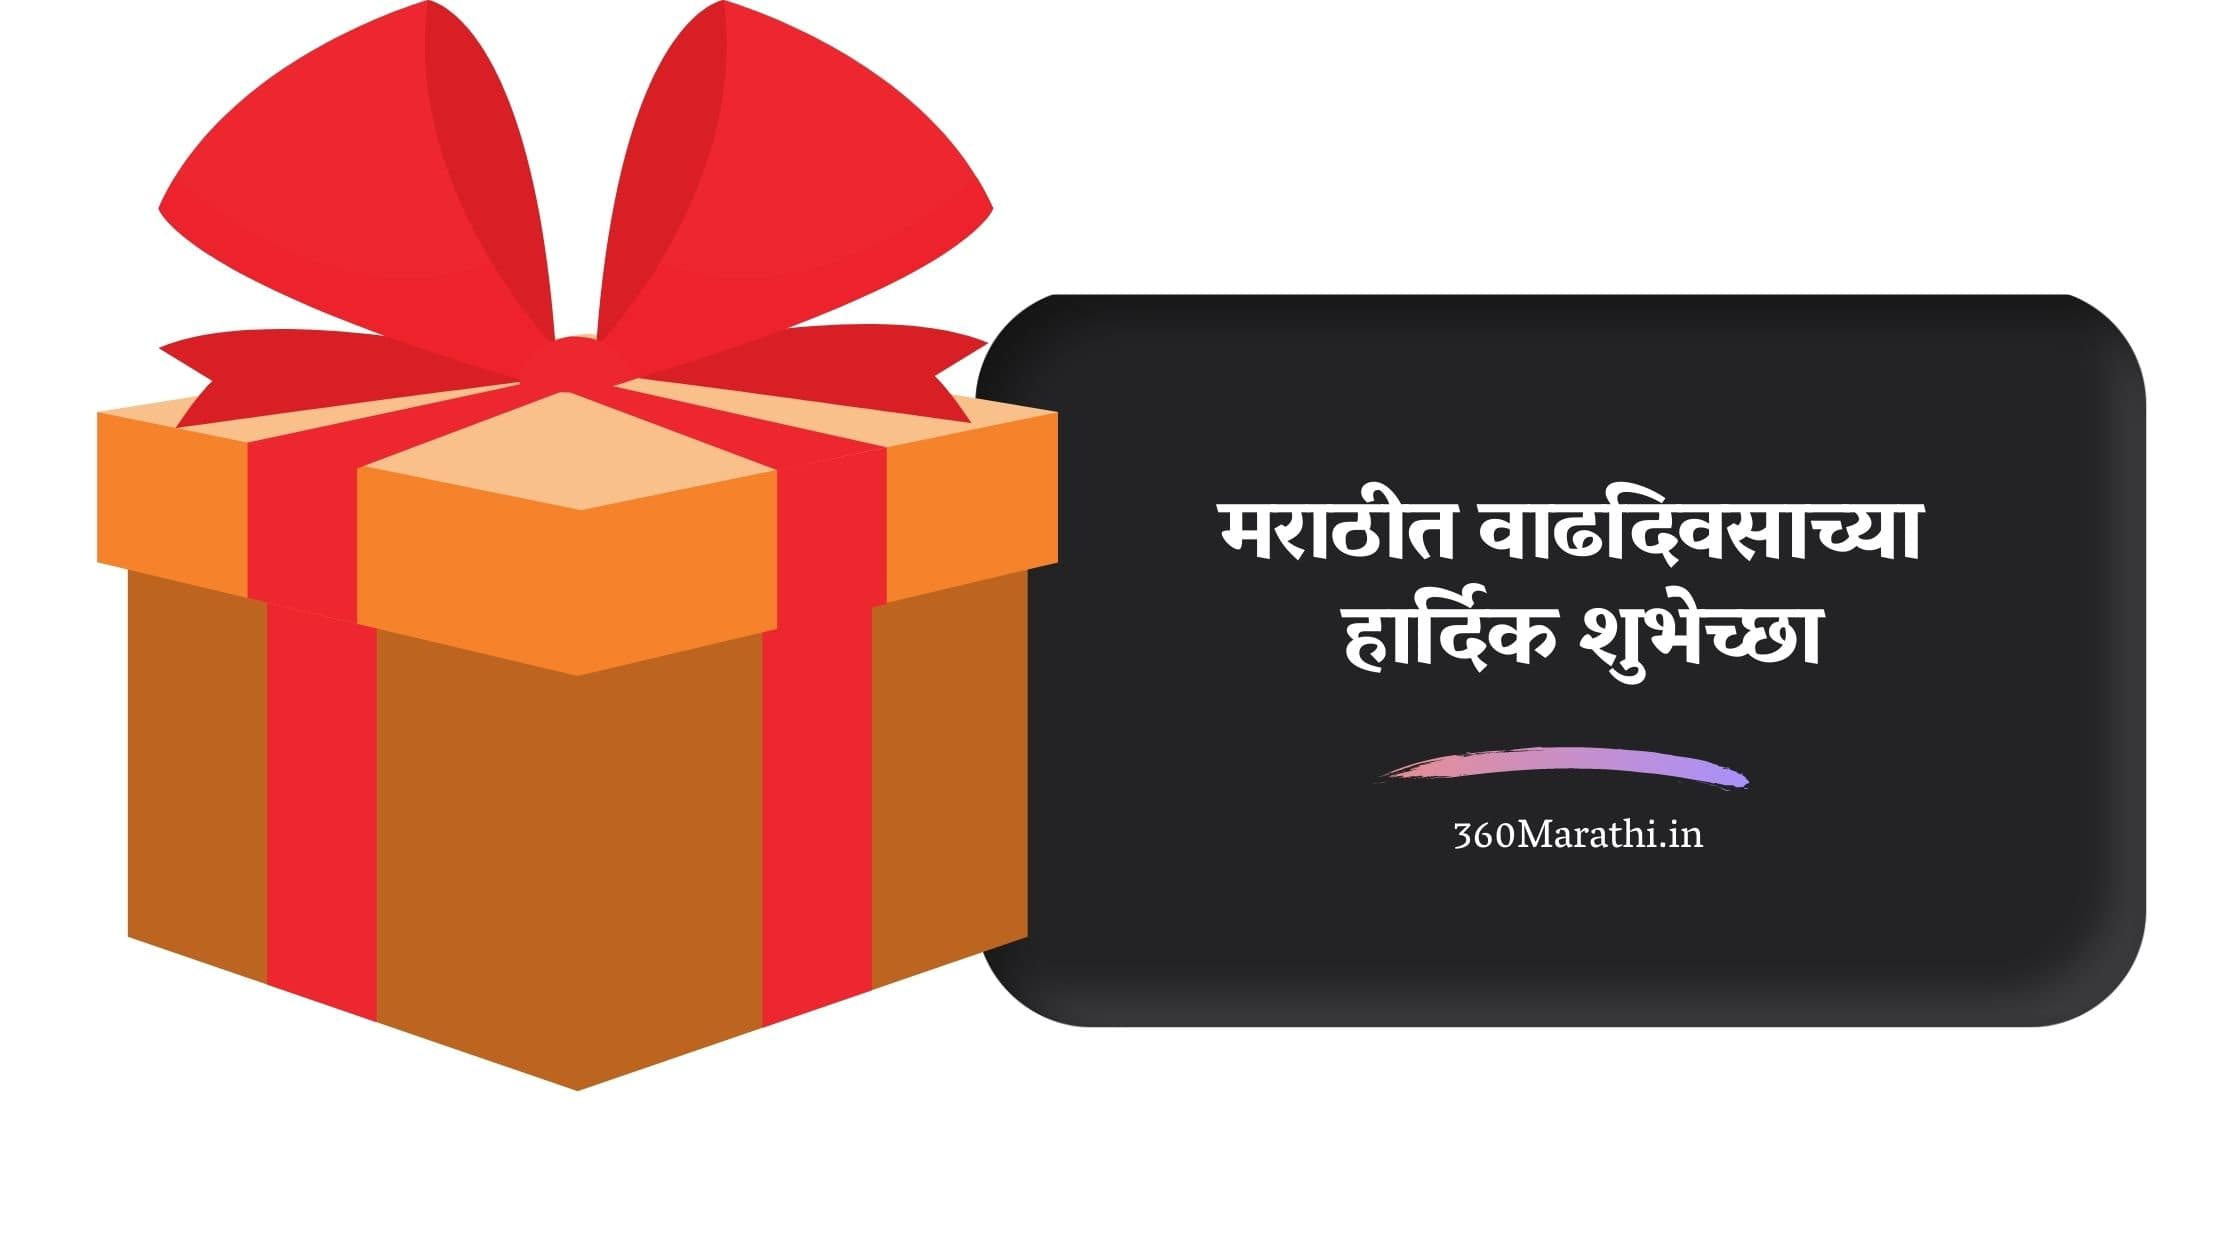 Birthday Wishes in Marathi   वाढदिवसाच्या हार्दिक शुभेच्छा